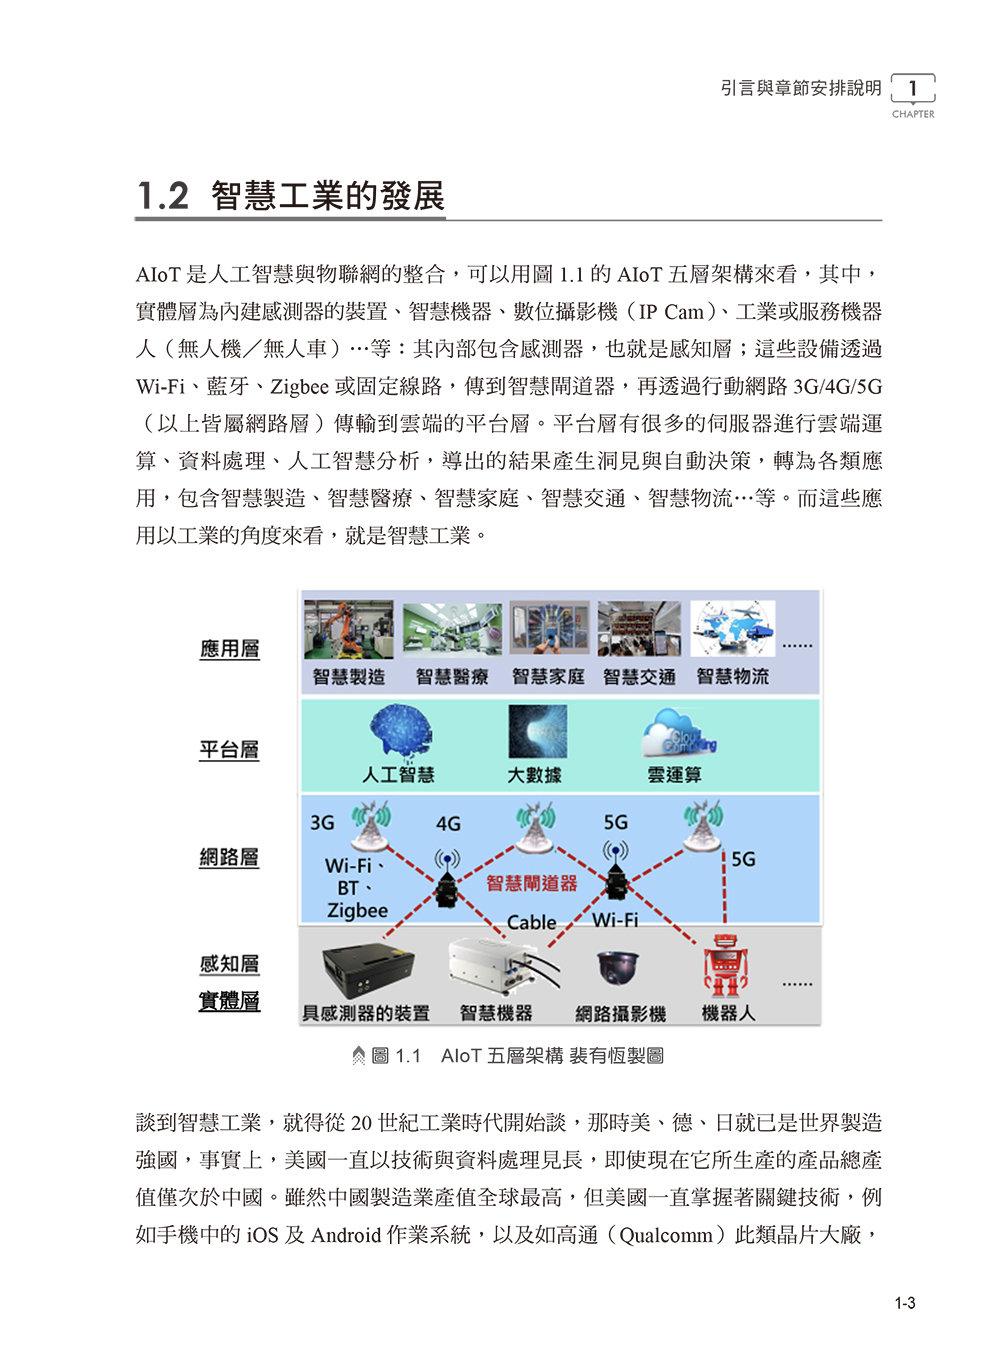 AIoT 數位轉型在中小製造企業的實踐-preview-12